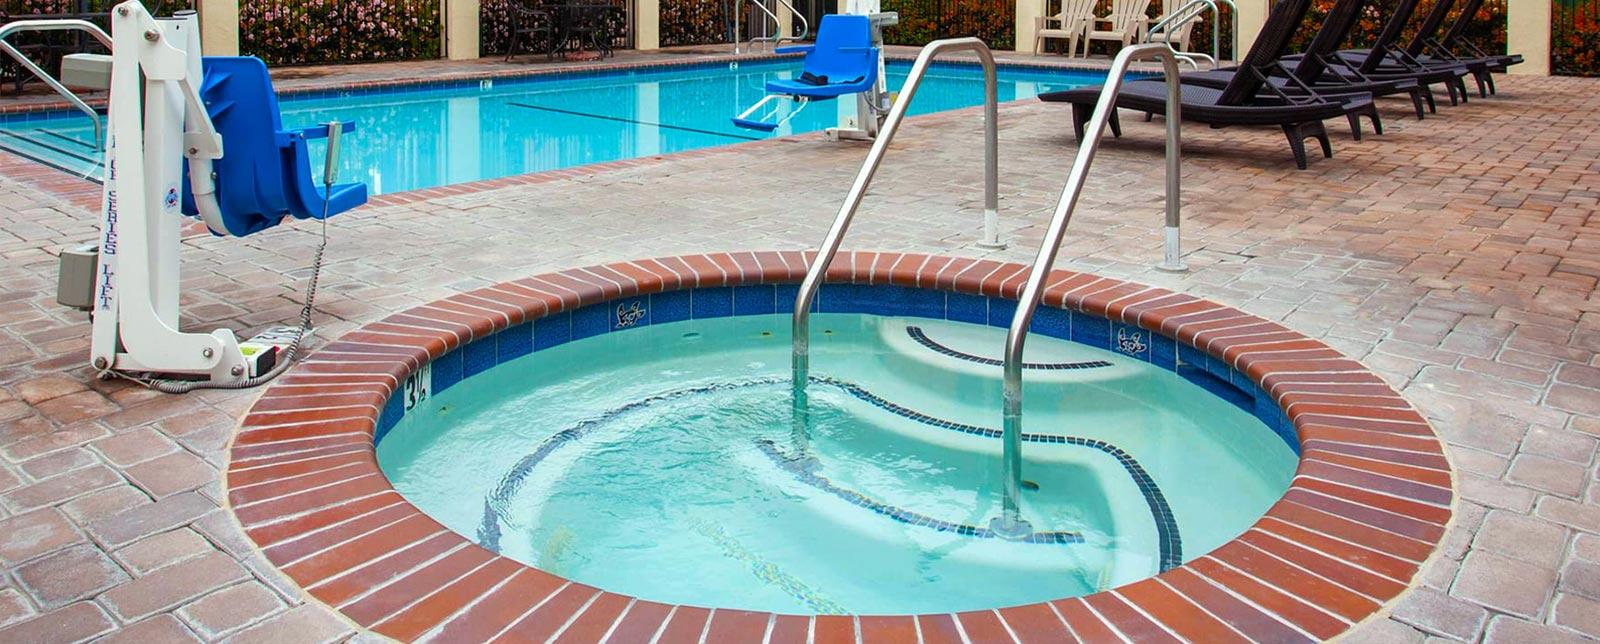 Services at Travelodge Anaheim Inn & Suites California